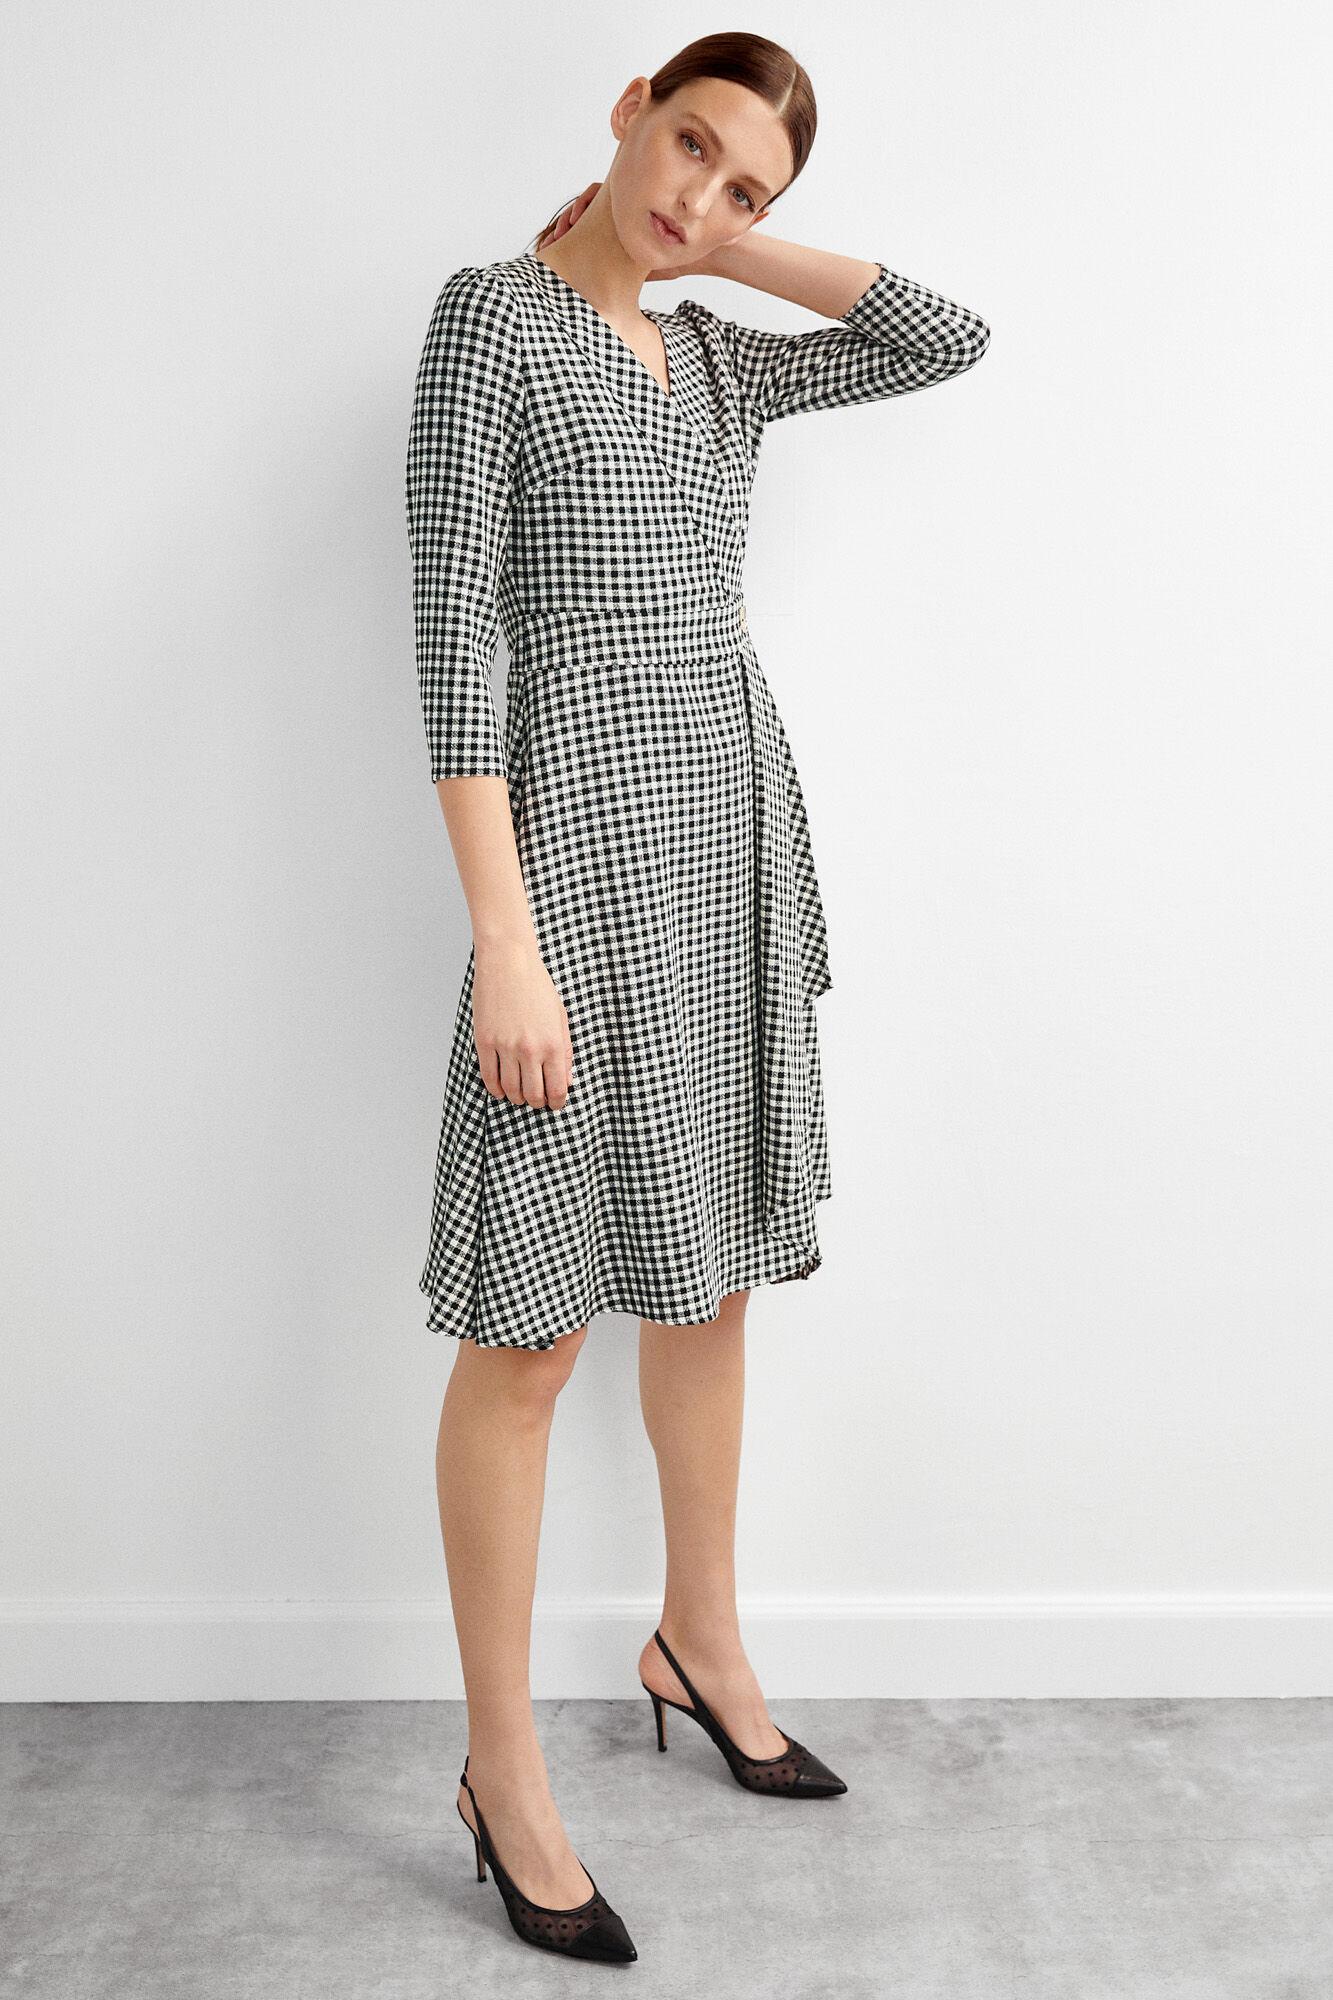 Vestidos pedro del hierro primavera verano 2019